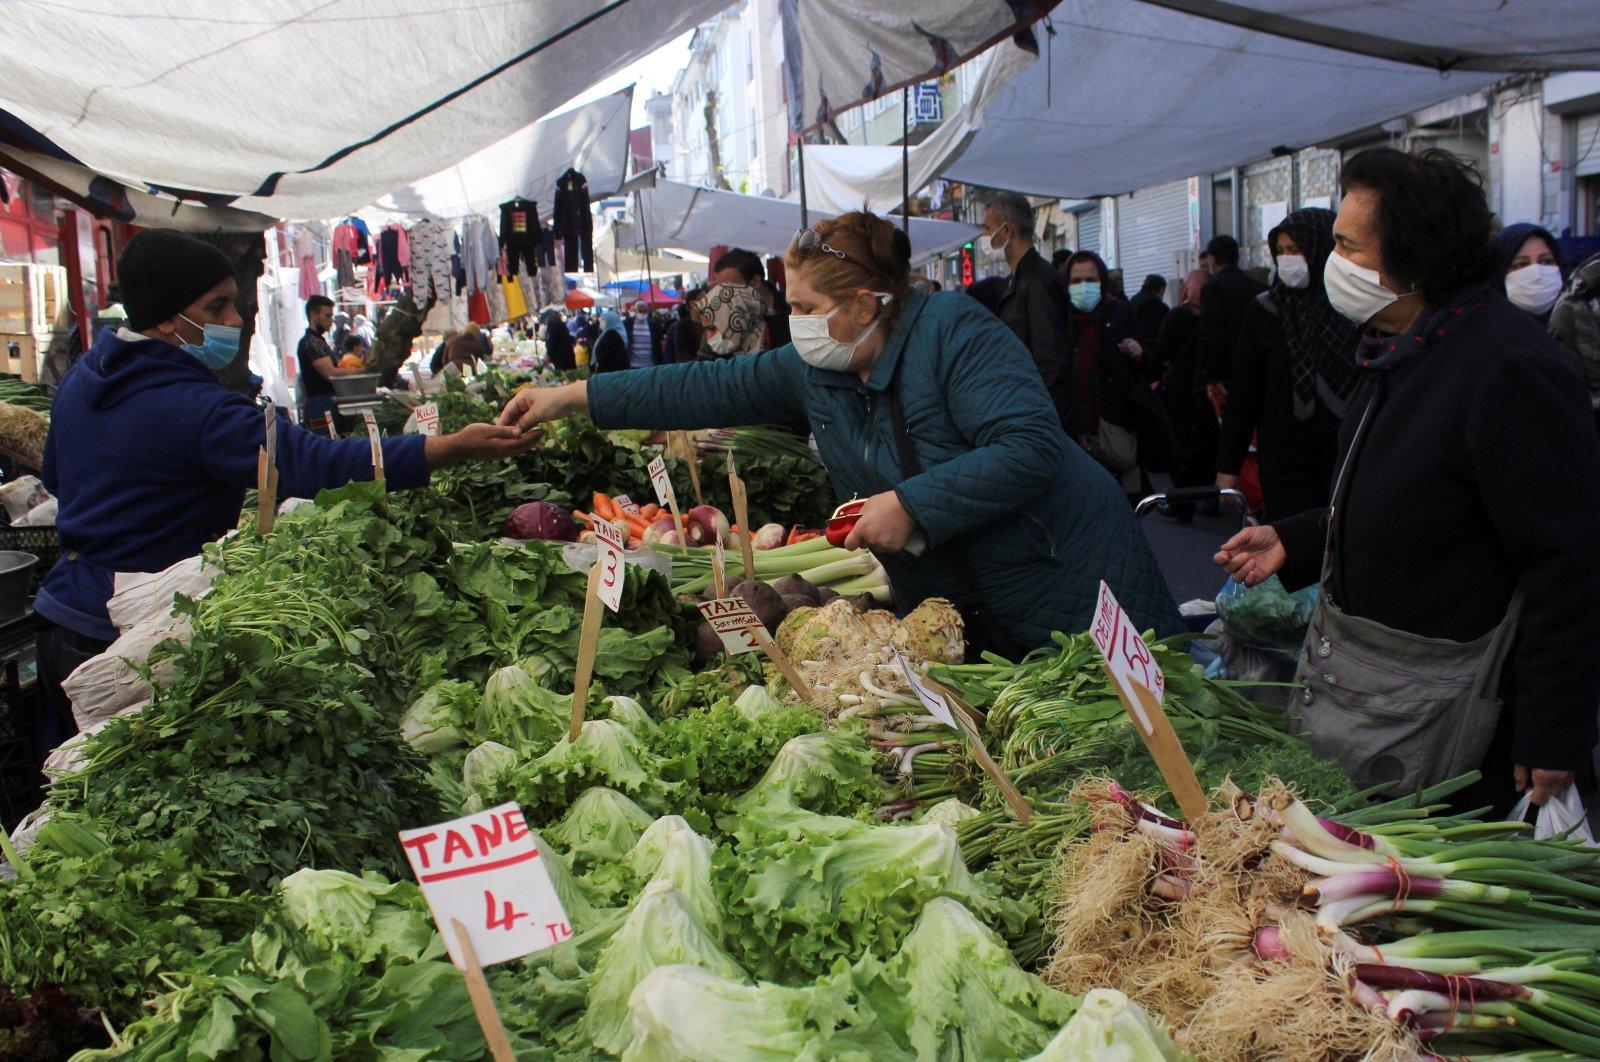 People wearing protective face masks shop at a fresh food market amid the coronavirus disease (COVID-19) pandemic, Istanbul, Turkey April 26, 2021. (Reuters Photo)